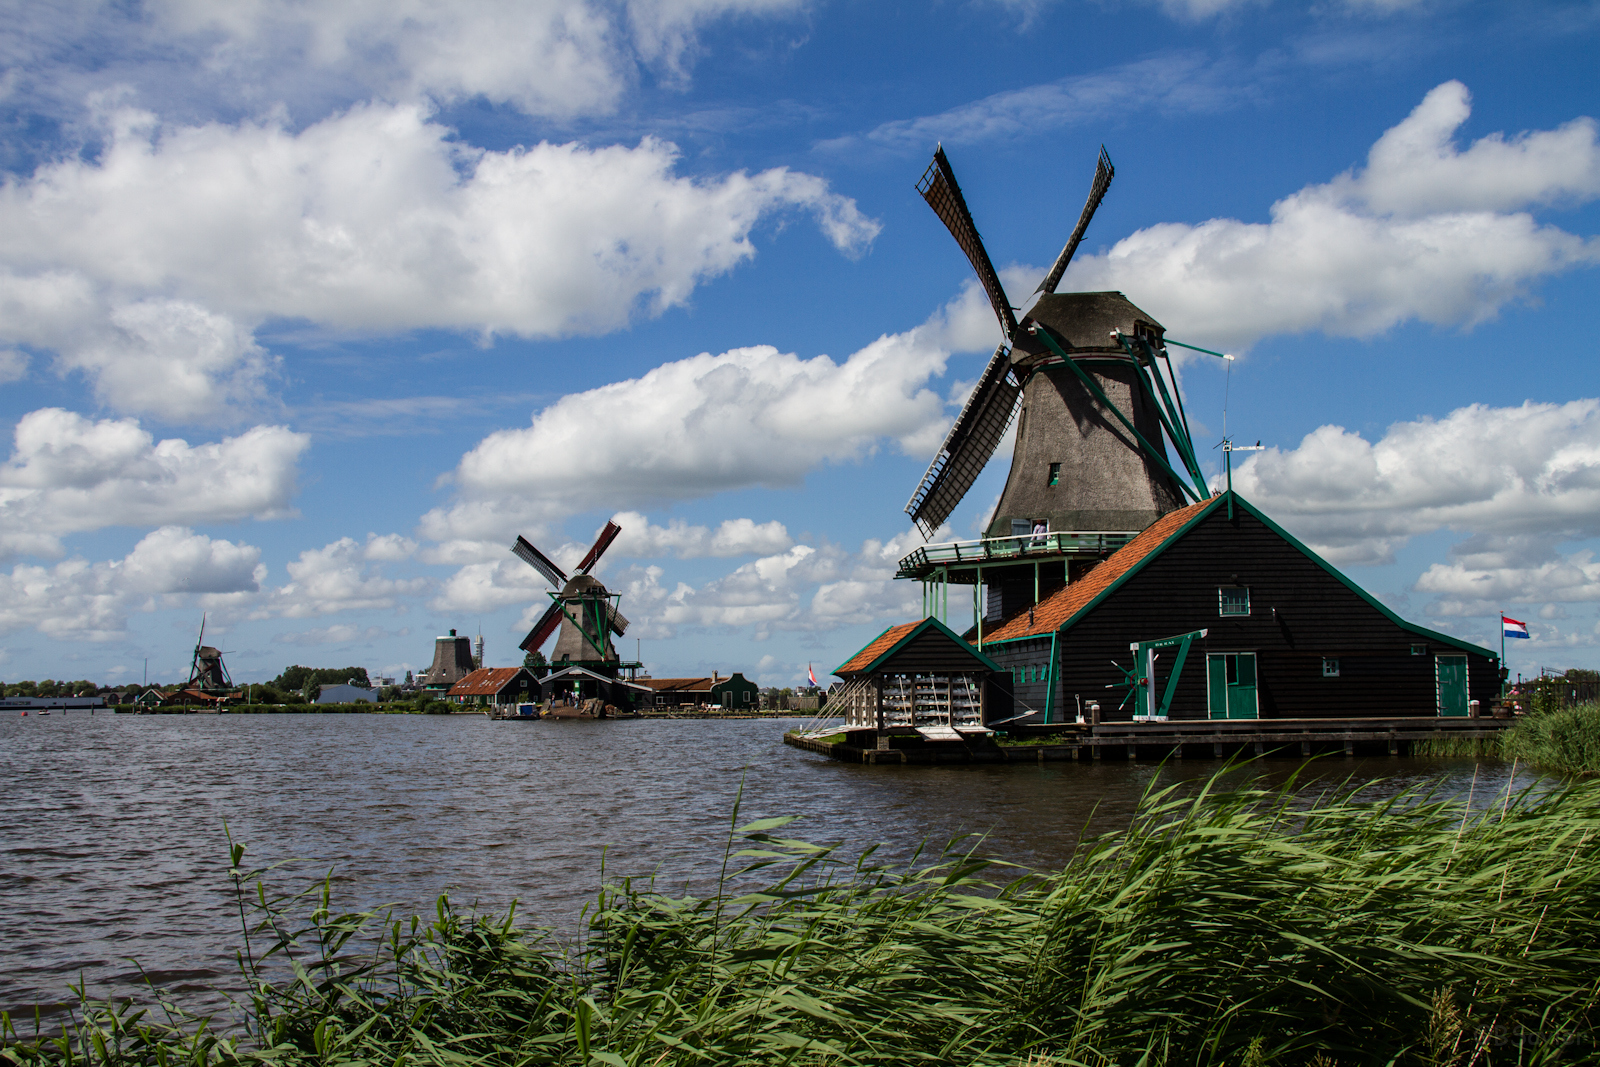 ZAANSE SCHANS WINDMILLS NEAR AMSTERDAM - DAY TRIP FROM AMSTERDAM